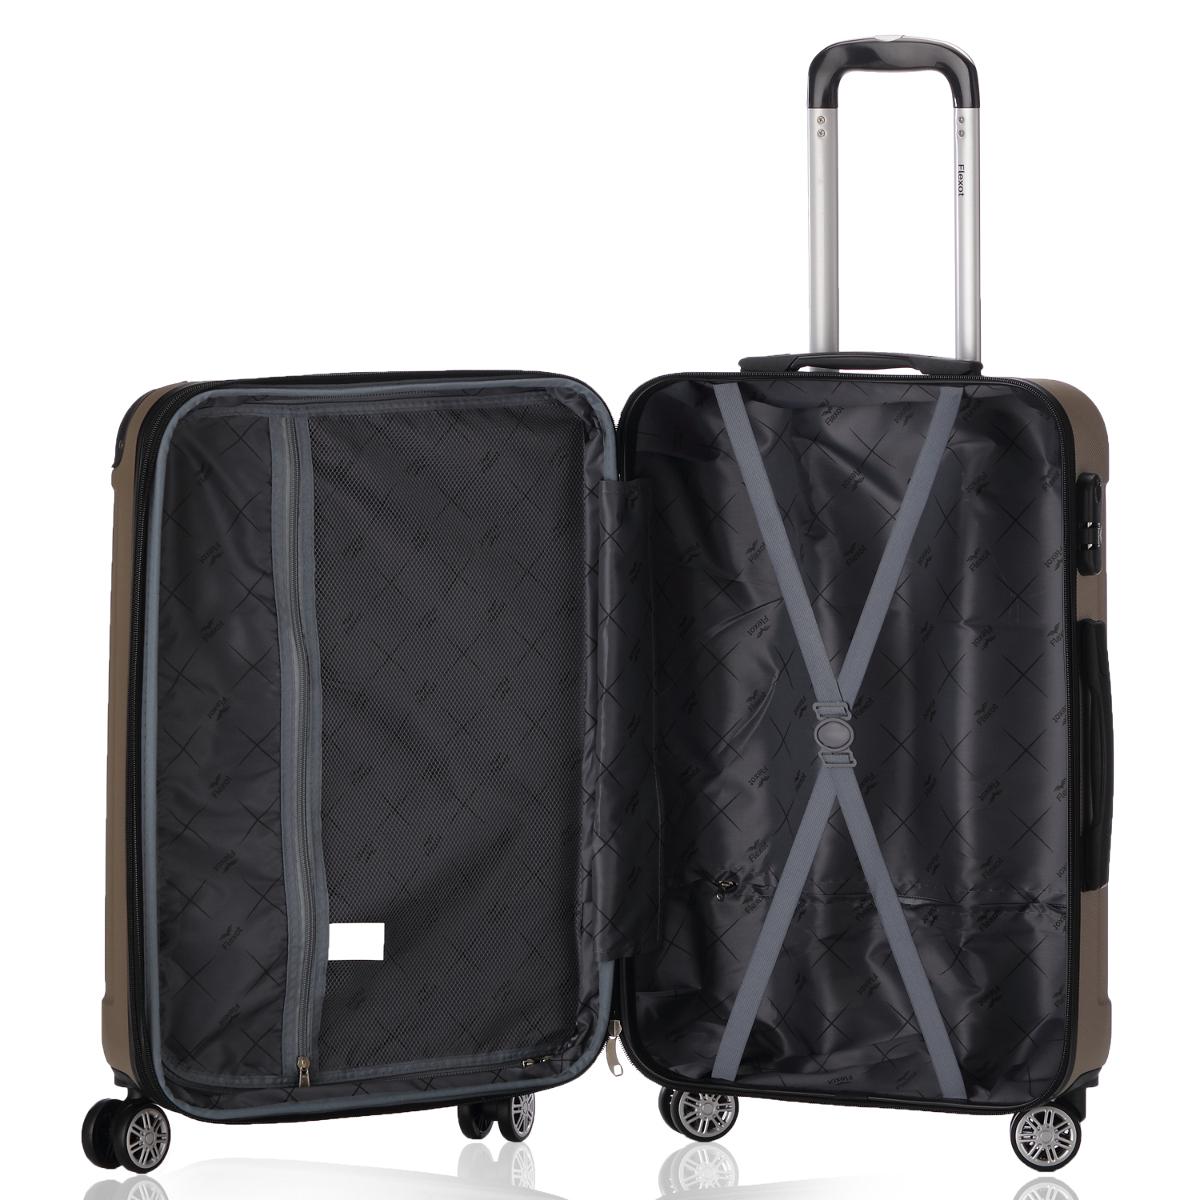 Koffer-Flexot-2045-Hartschalenkoffer-Trolley-Kofferset-Reisekoffer-M-L-XL-Set Indexbild 51